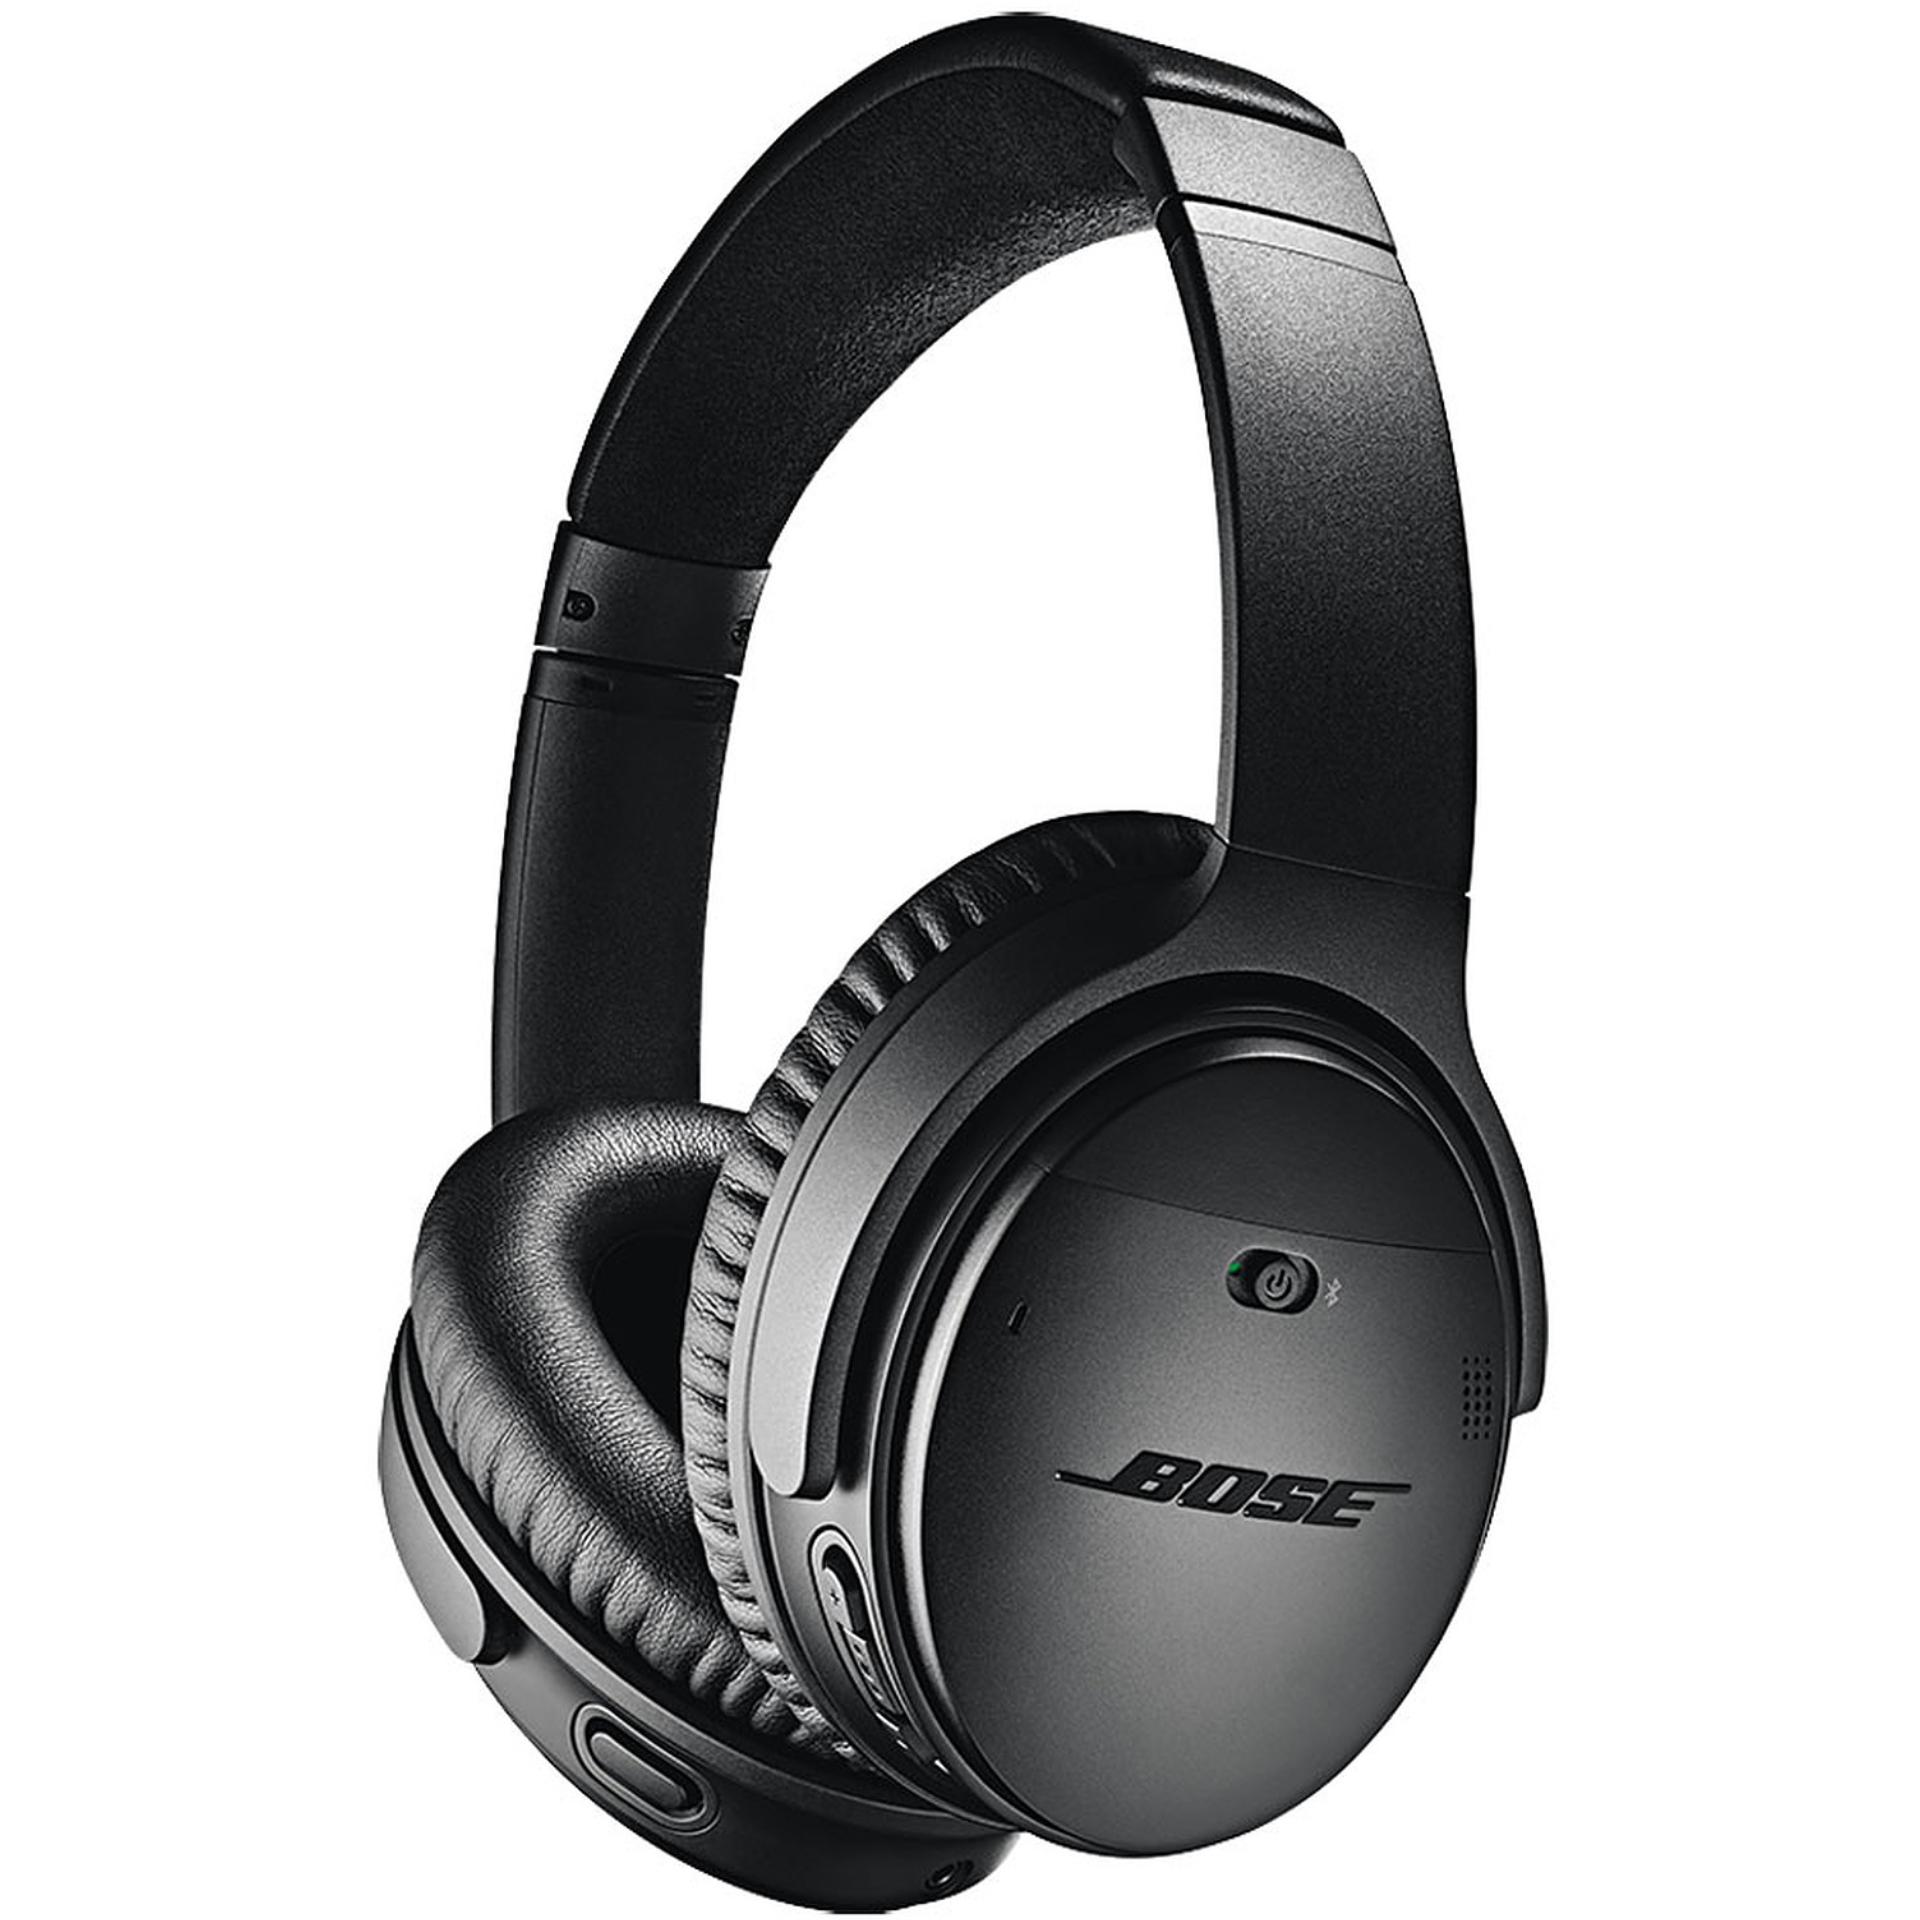 Bose QuietComfort 35 II: Bluetooth Kopfhörer + 18,20€ Superpoints (Active Noise Cancelling, 20h Akku, zwei Mikrofone, Google Assistant)